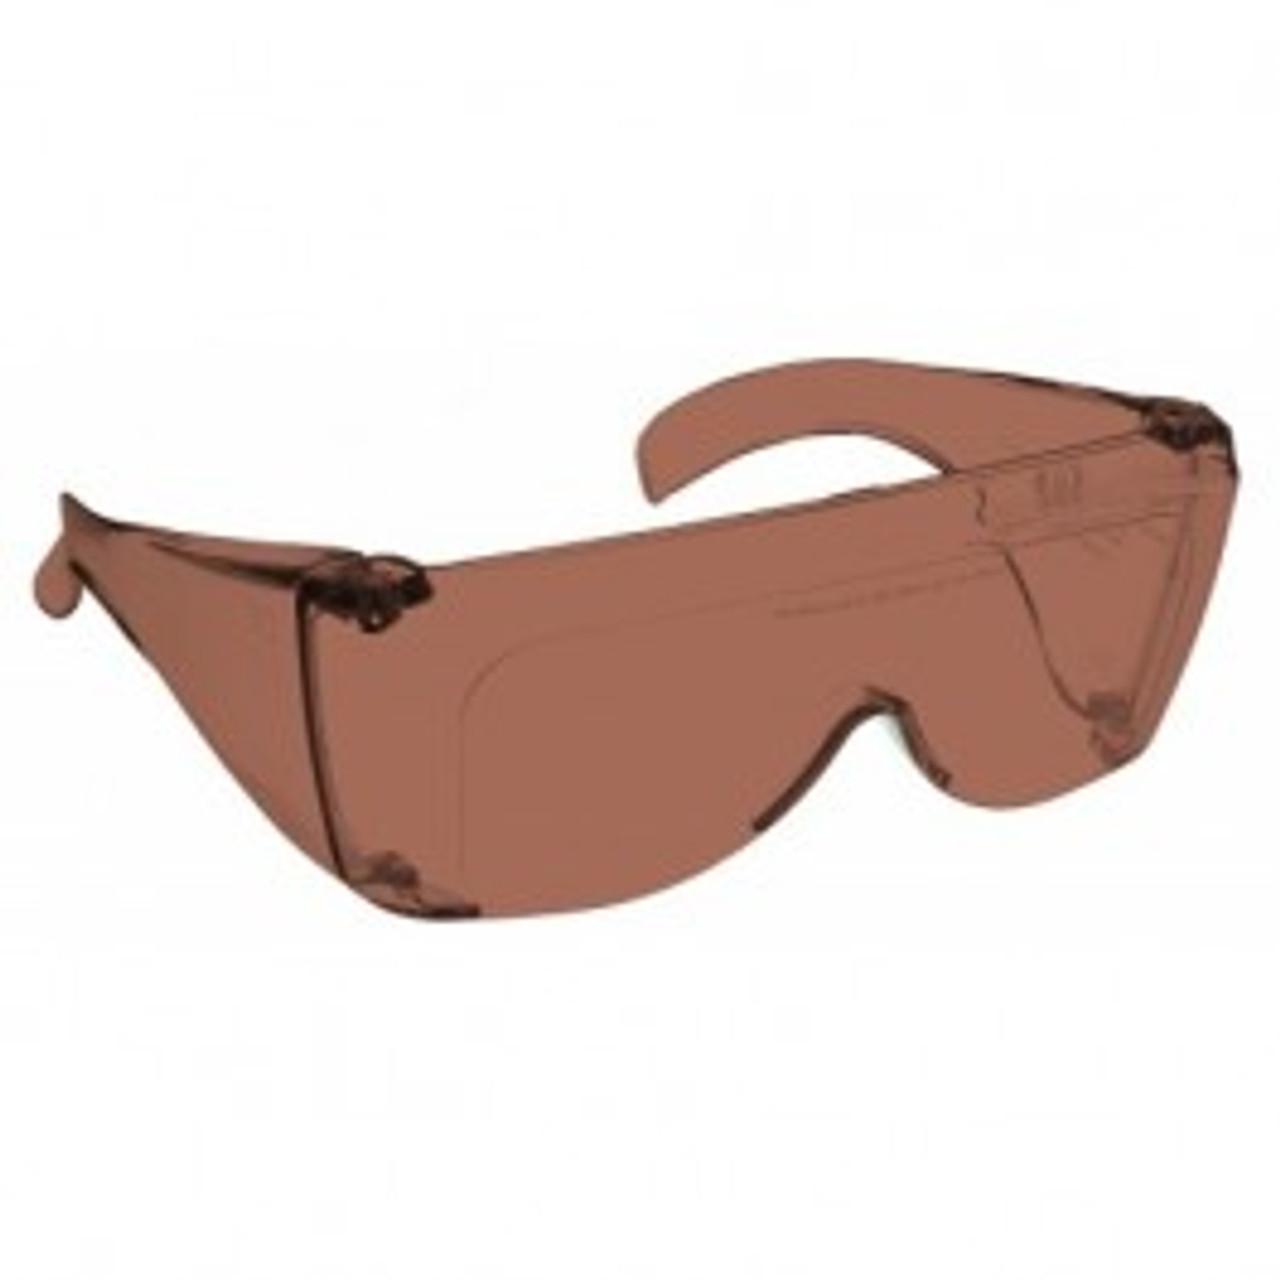 NoIR 19% Plum Fitover Sunglasses Large